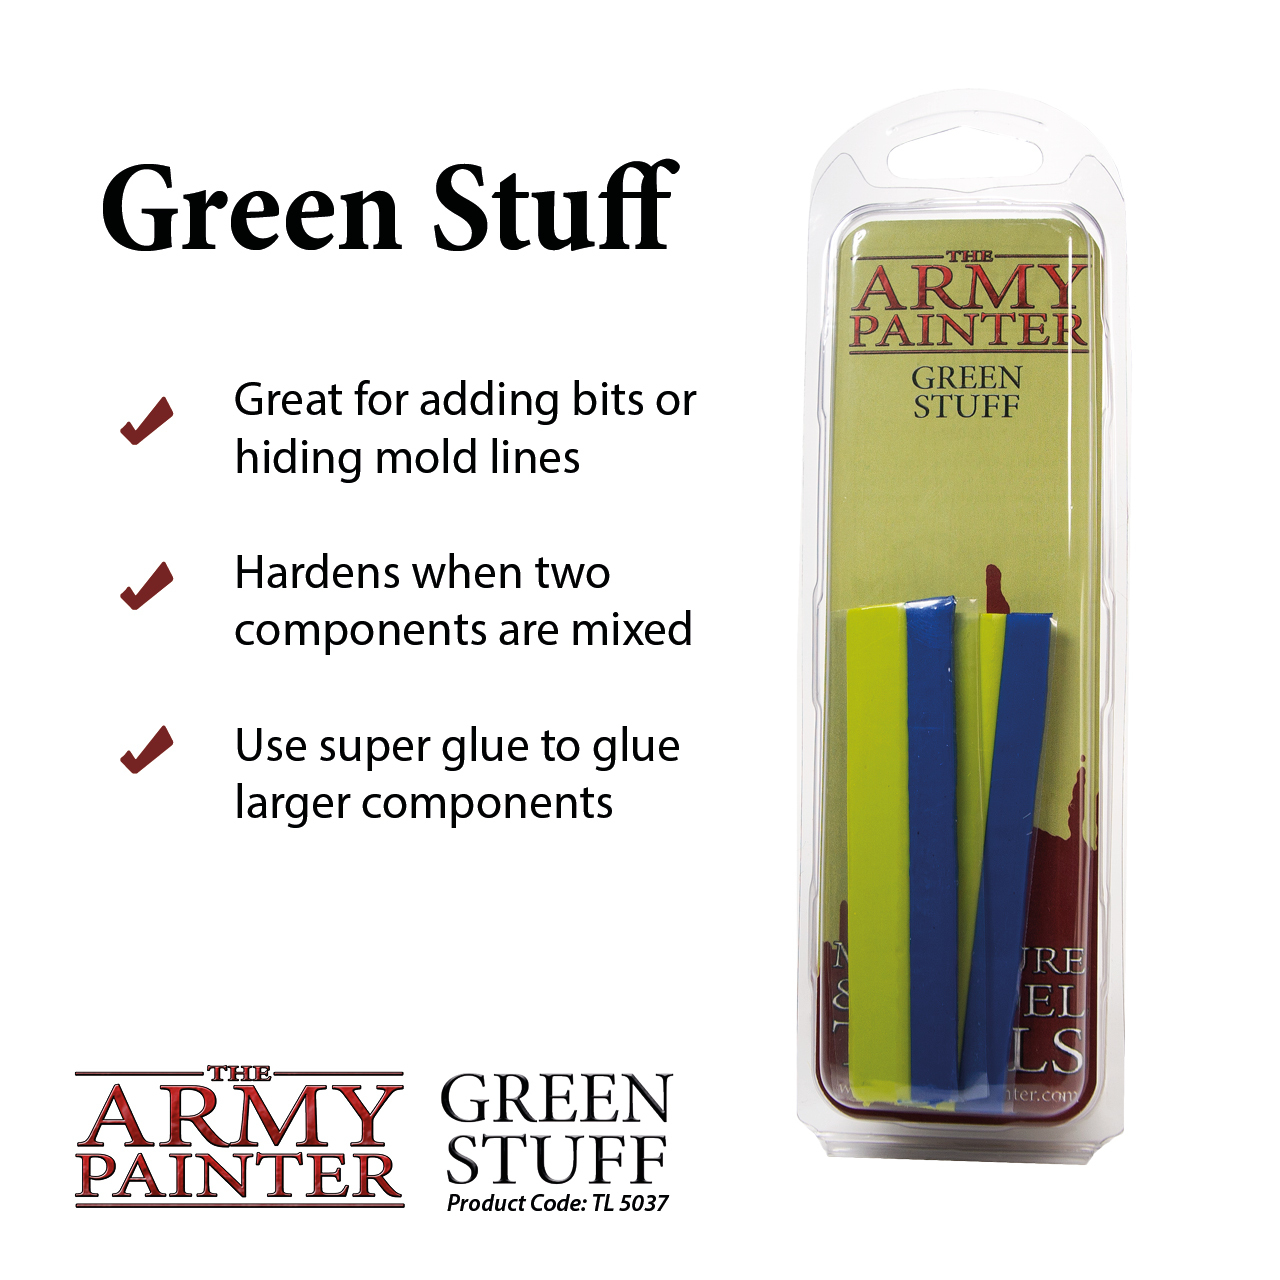 Army Painter: Green Stuff image